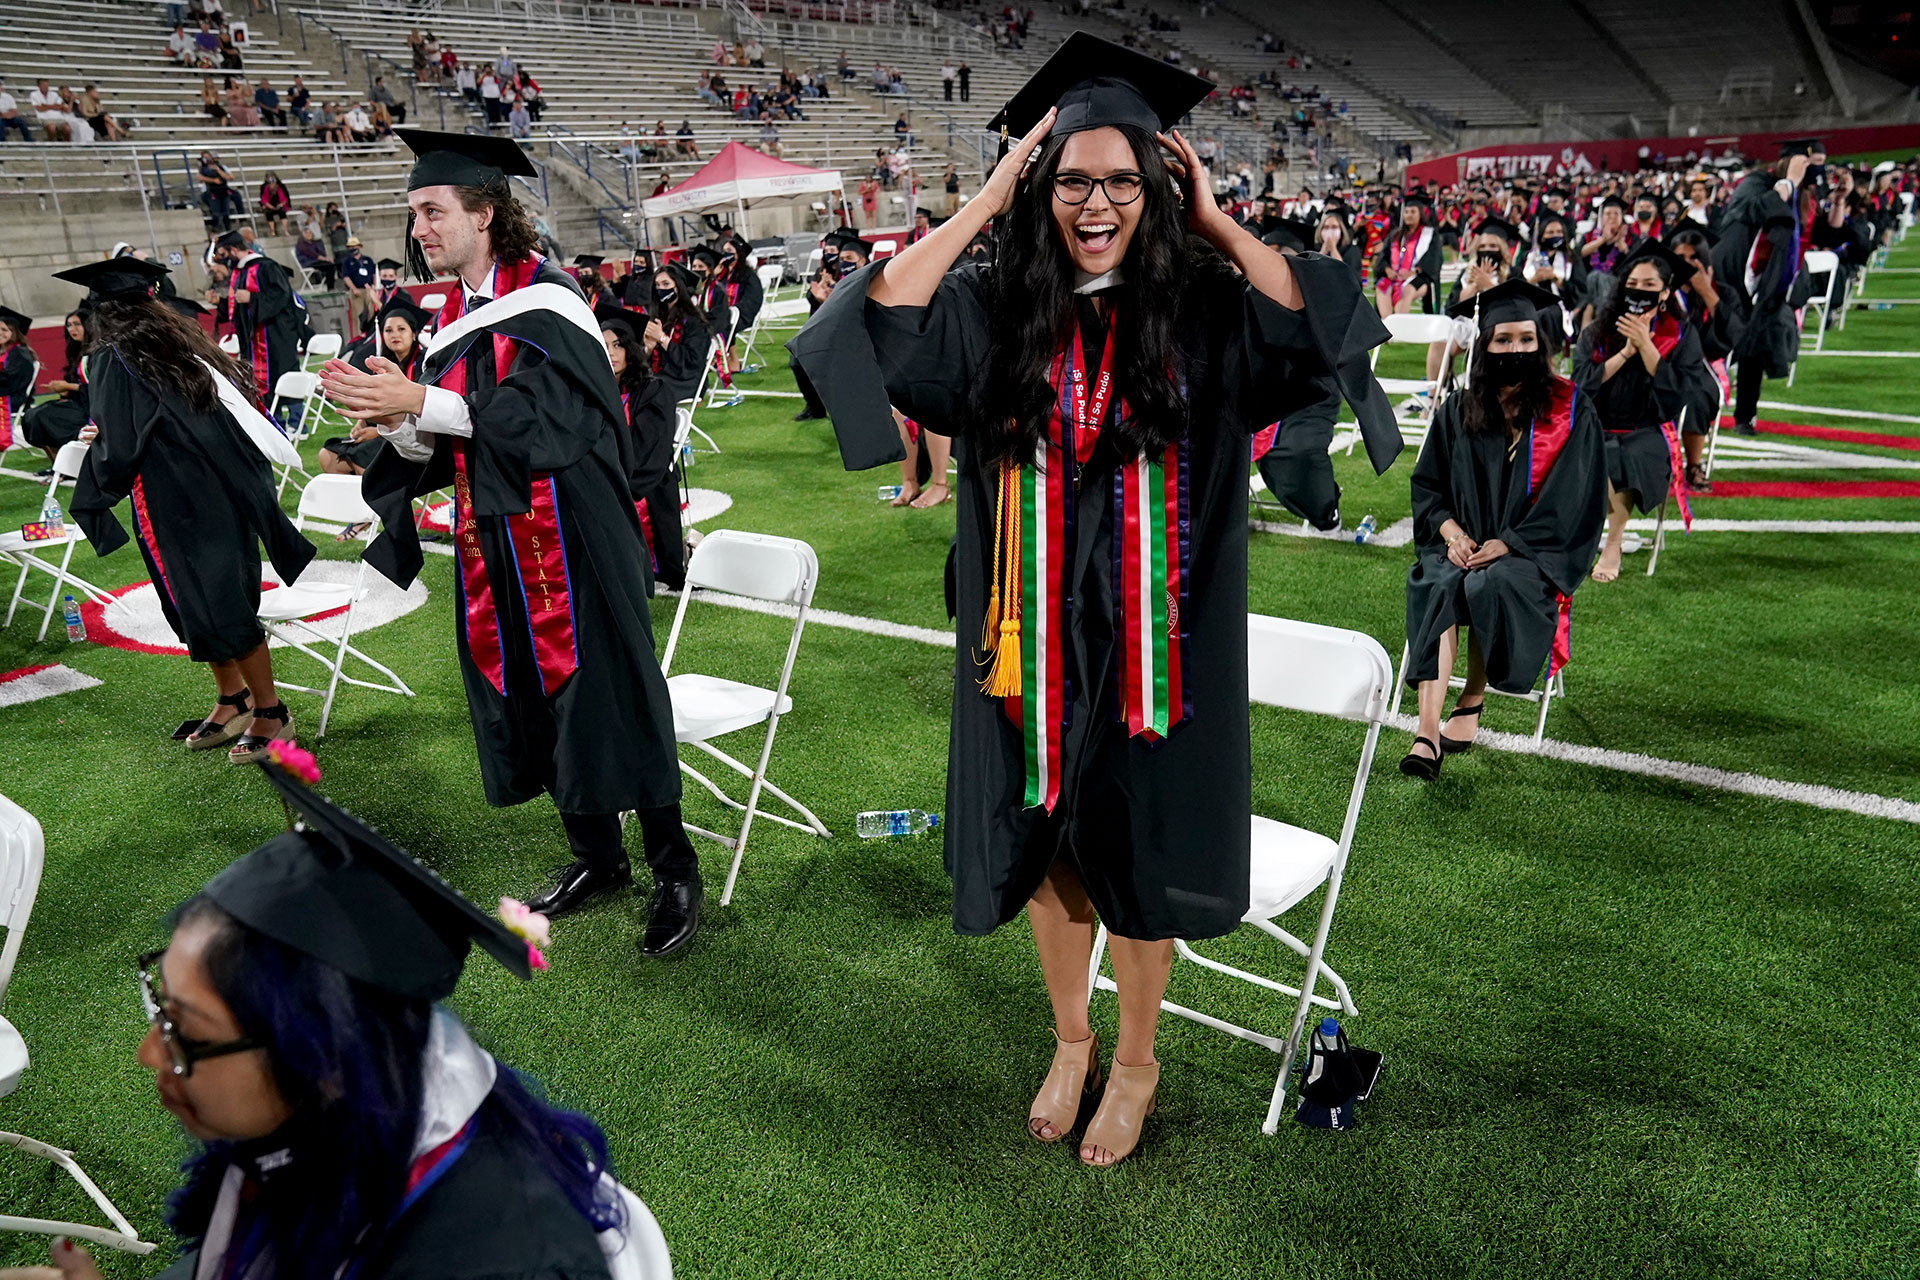 Graduate Victoria Cisneros during commencement. Photo by Cary Edmondson